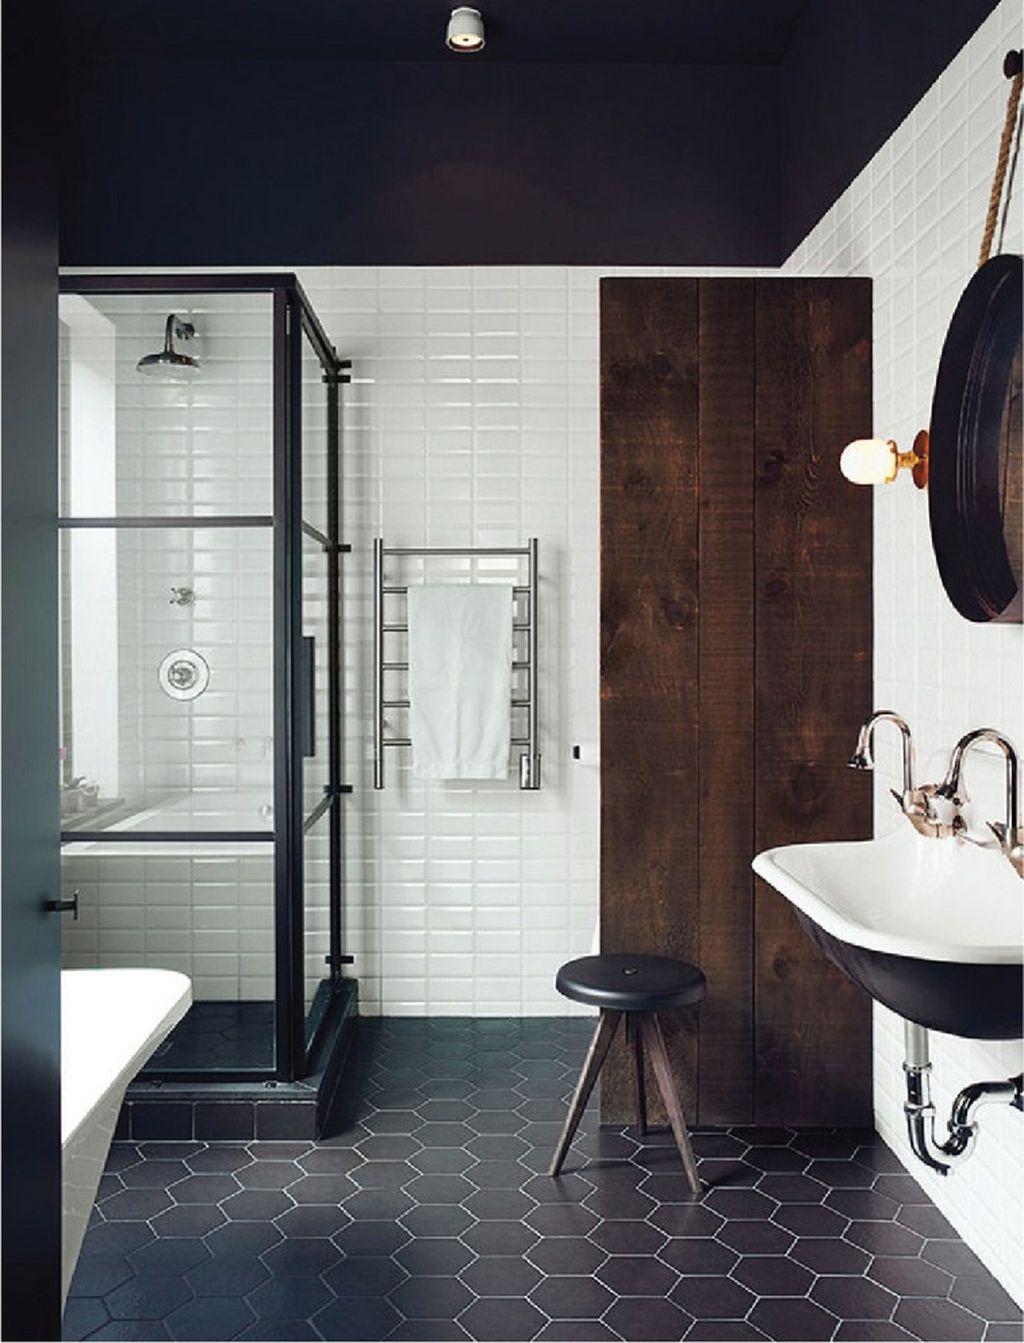 Unusual Bathroom Design Ideas You Need To Know 19